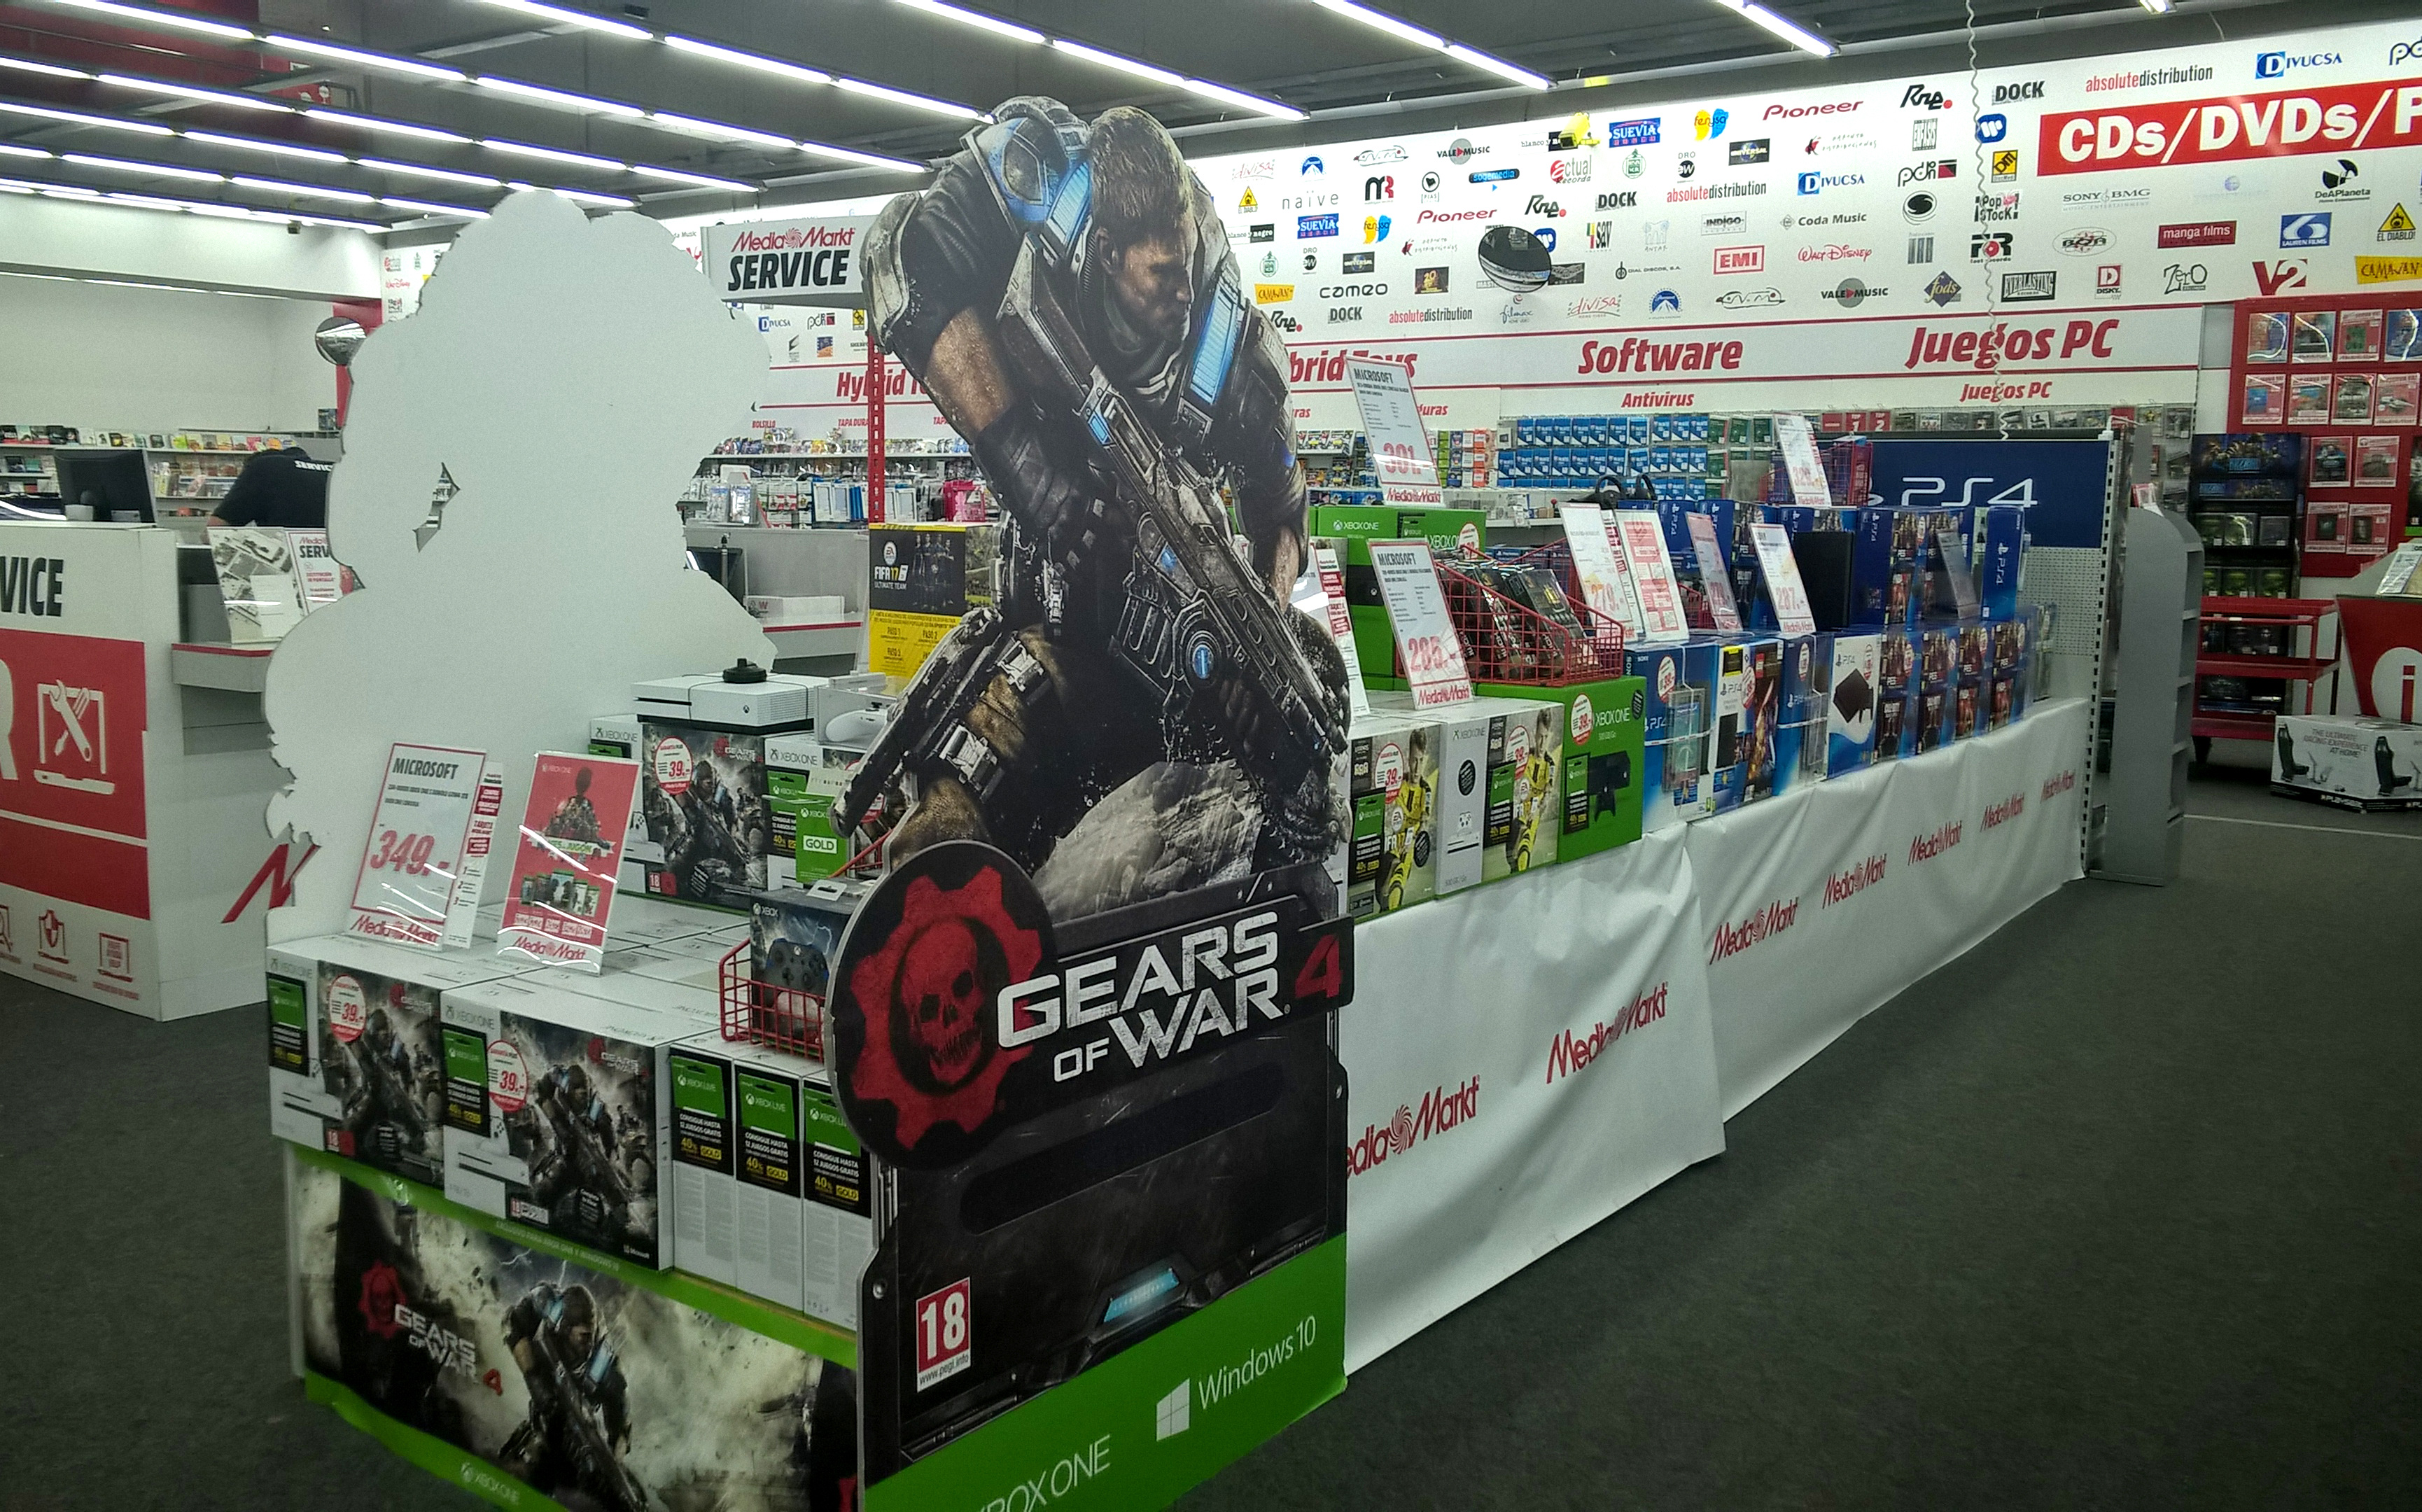 Corporeo Gears of Wars Media Markt